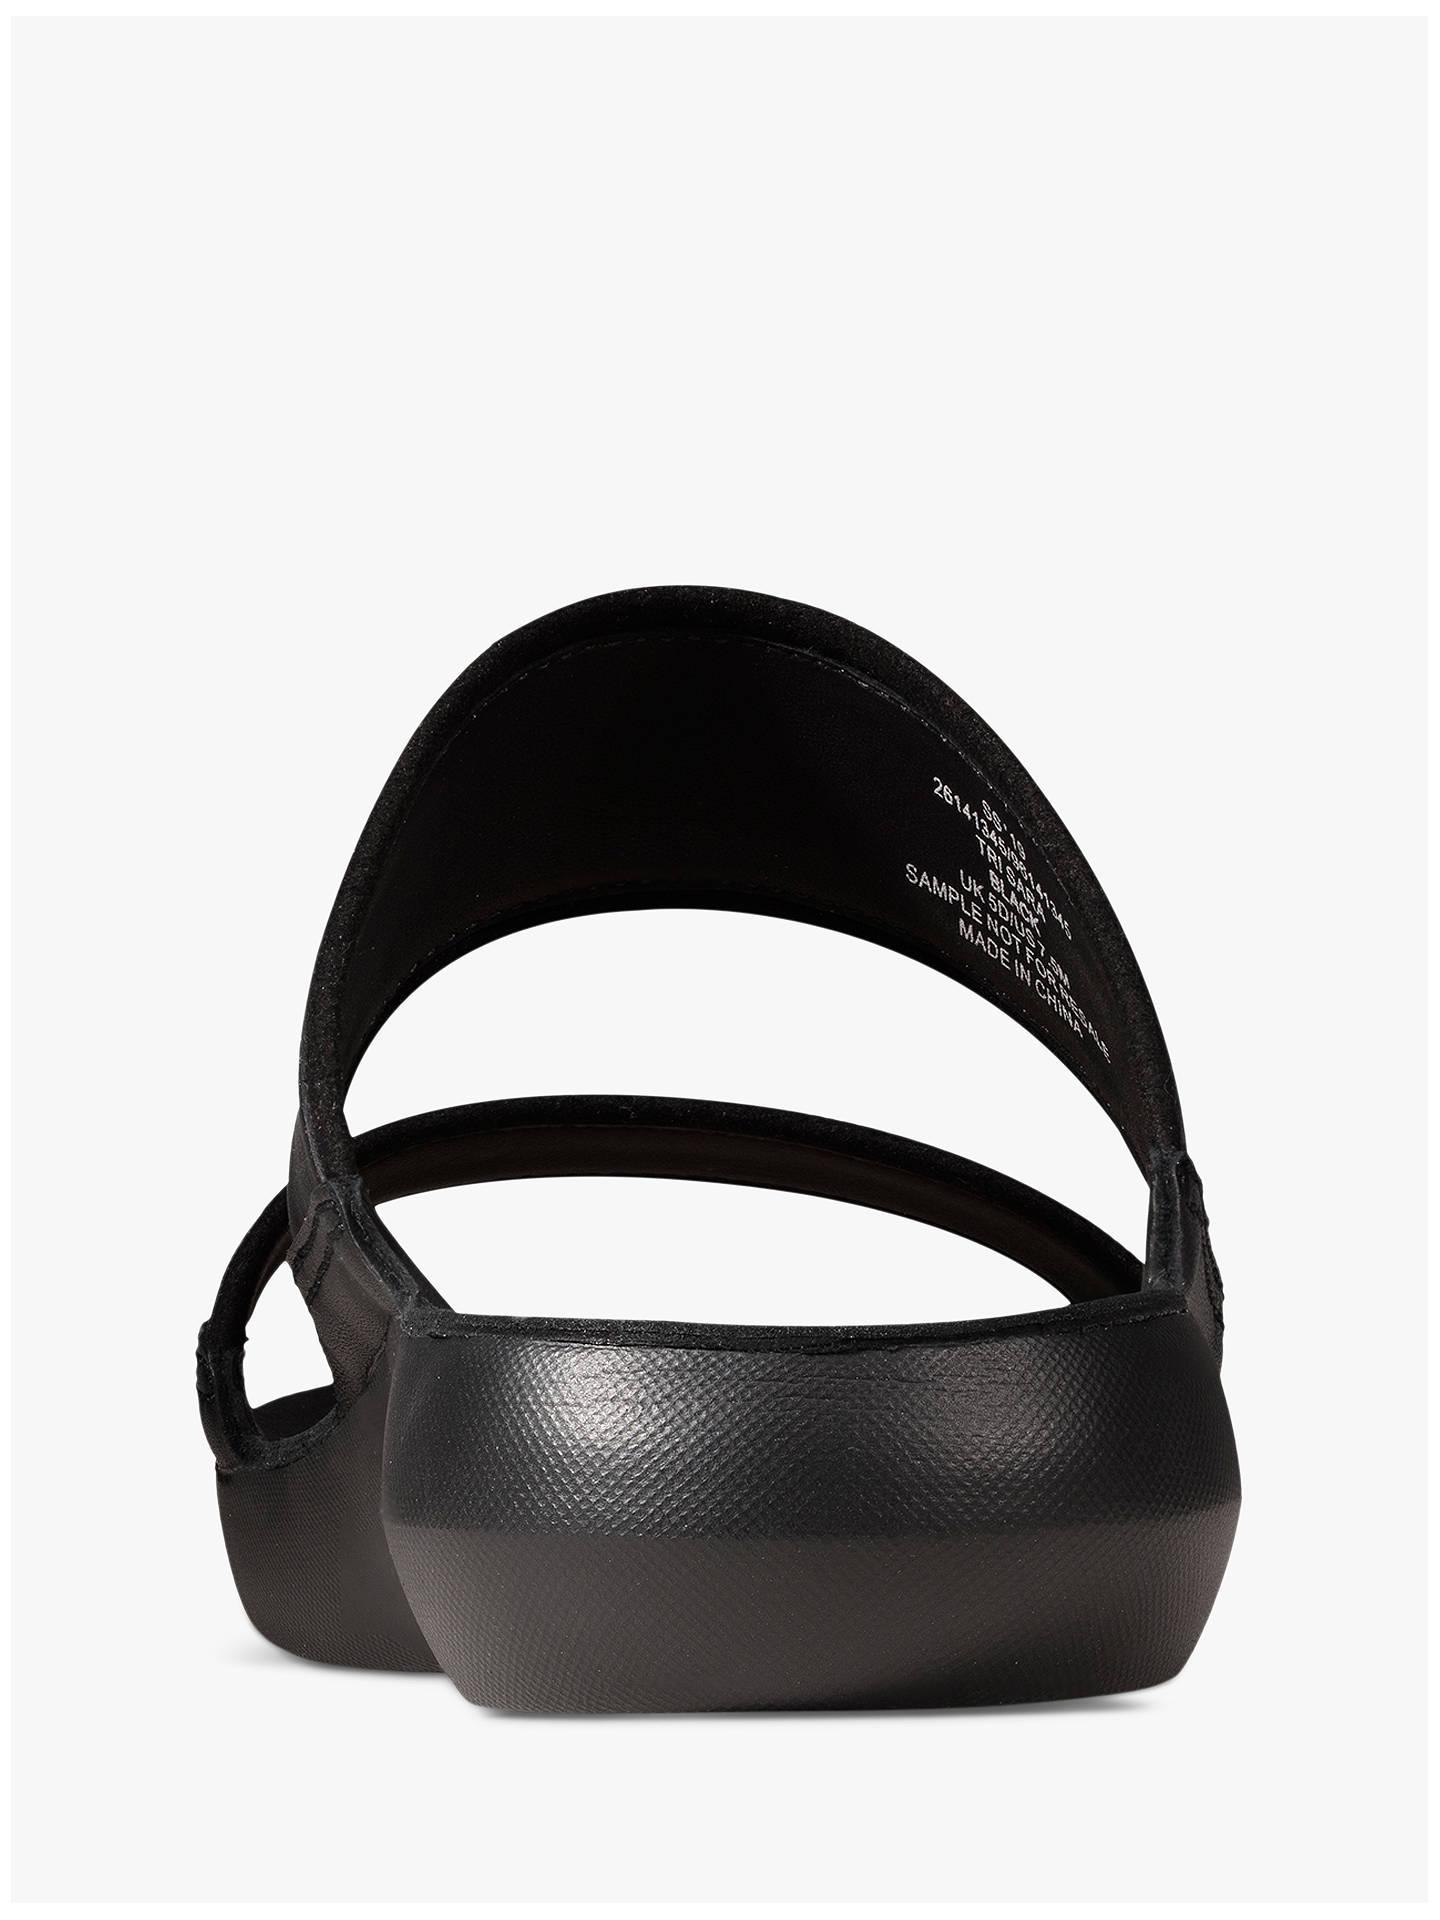 3c0f5606073 Clarks Tri Sara Double Strap Slide Sandals at John Lewis   Partners